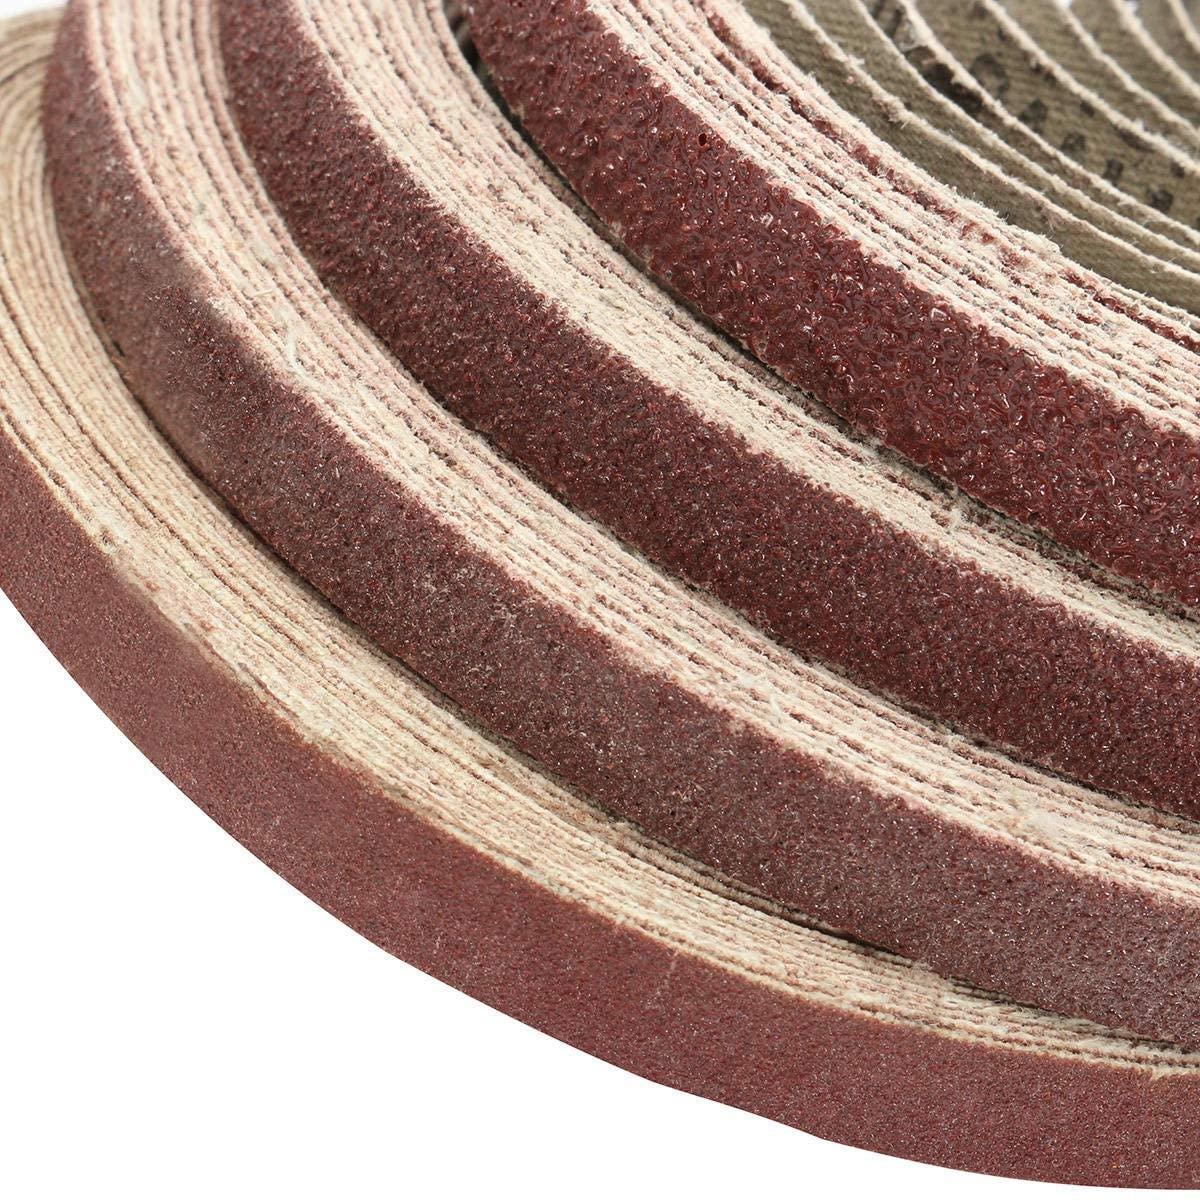 Nuokix 50pcs 10x330mm Zirconia Sanding Belt 40/60/80/120 Grit Aluminium Oxide Abrasive Tools Abrasive (Size : 120#)